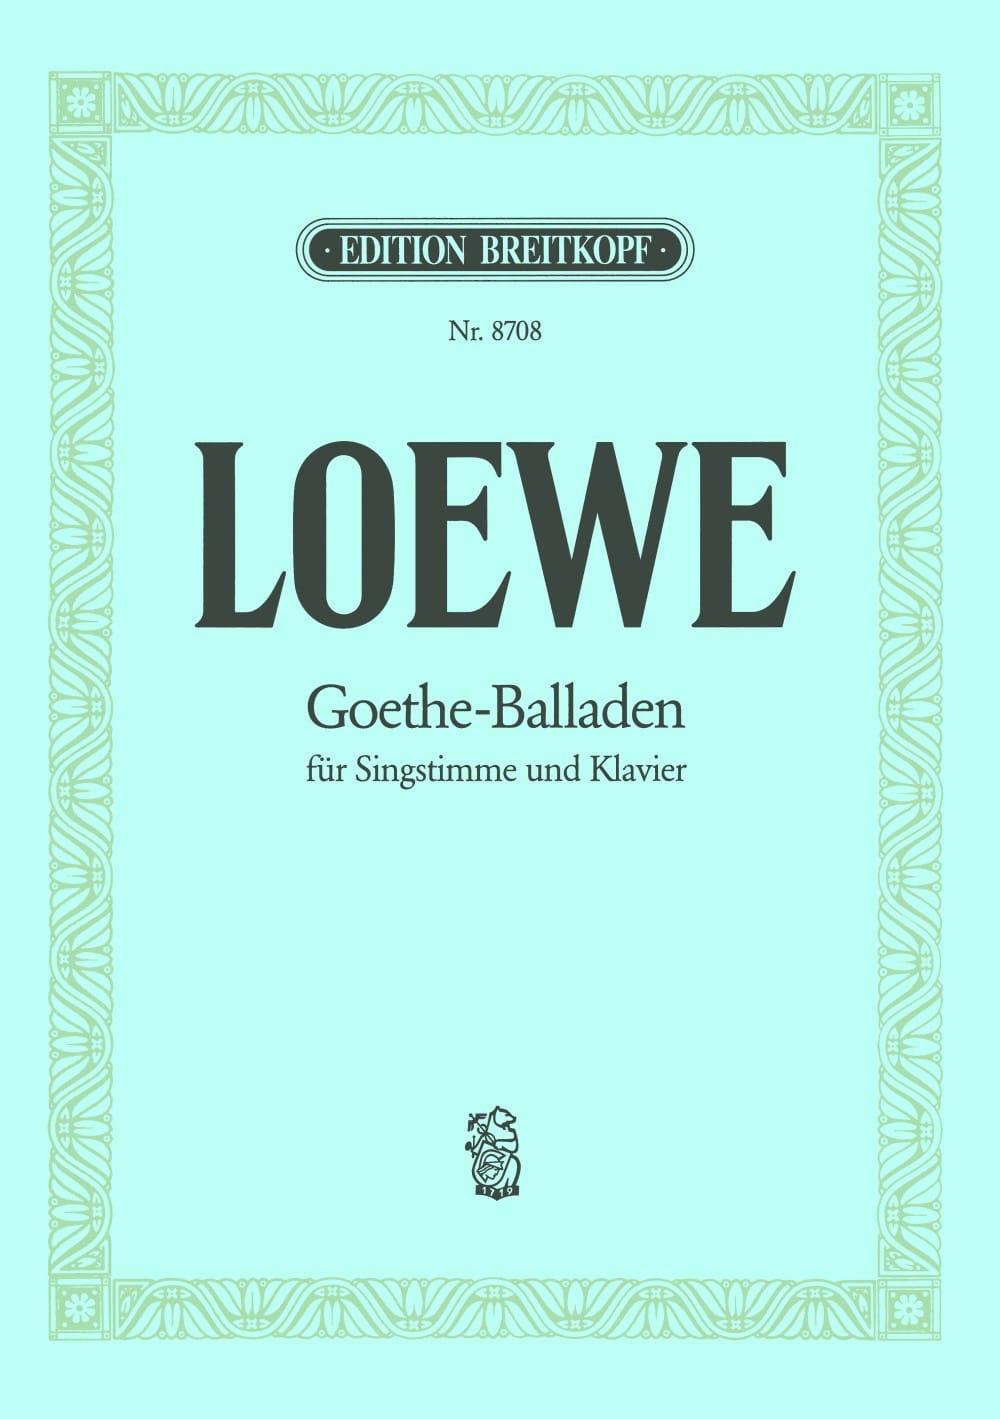 Goethe-Balladen - Carl Loewe - Partition - Mélodies - laflutedepan.com